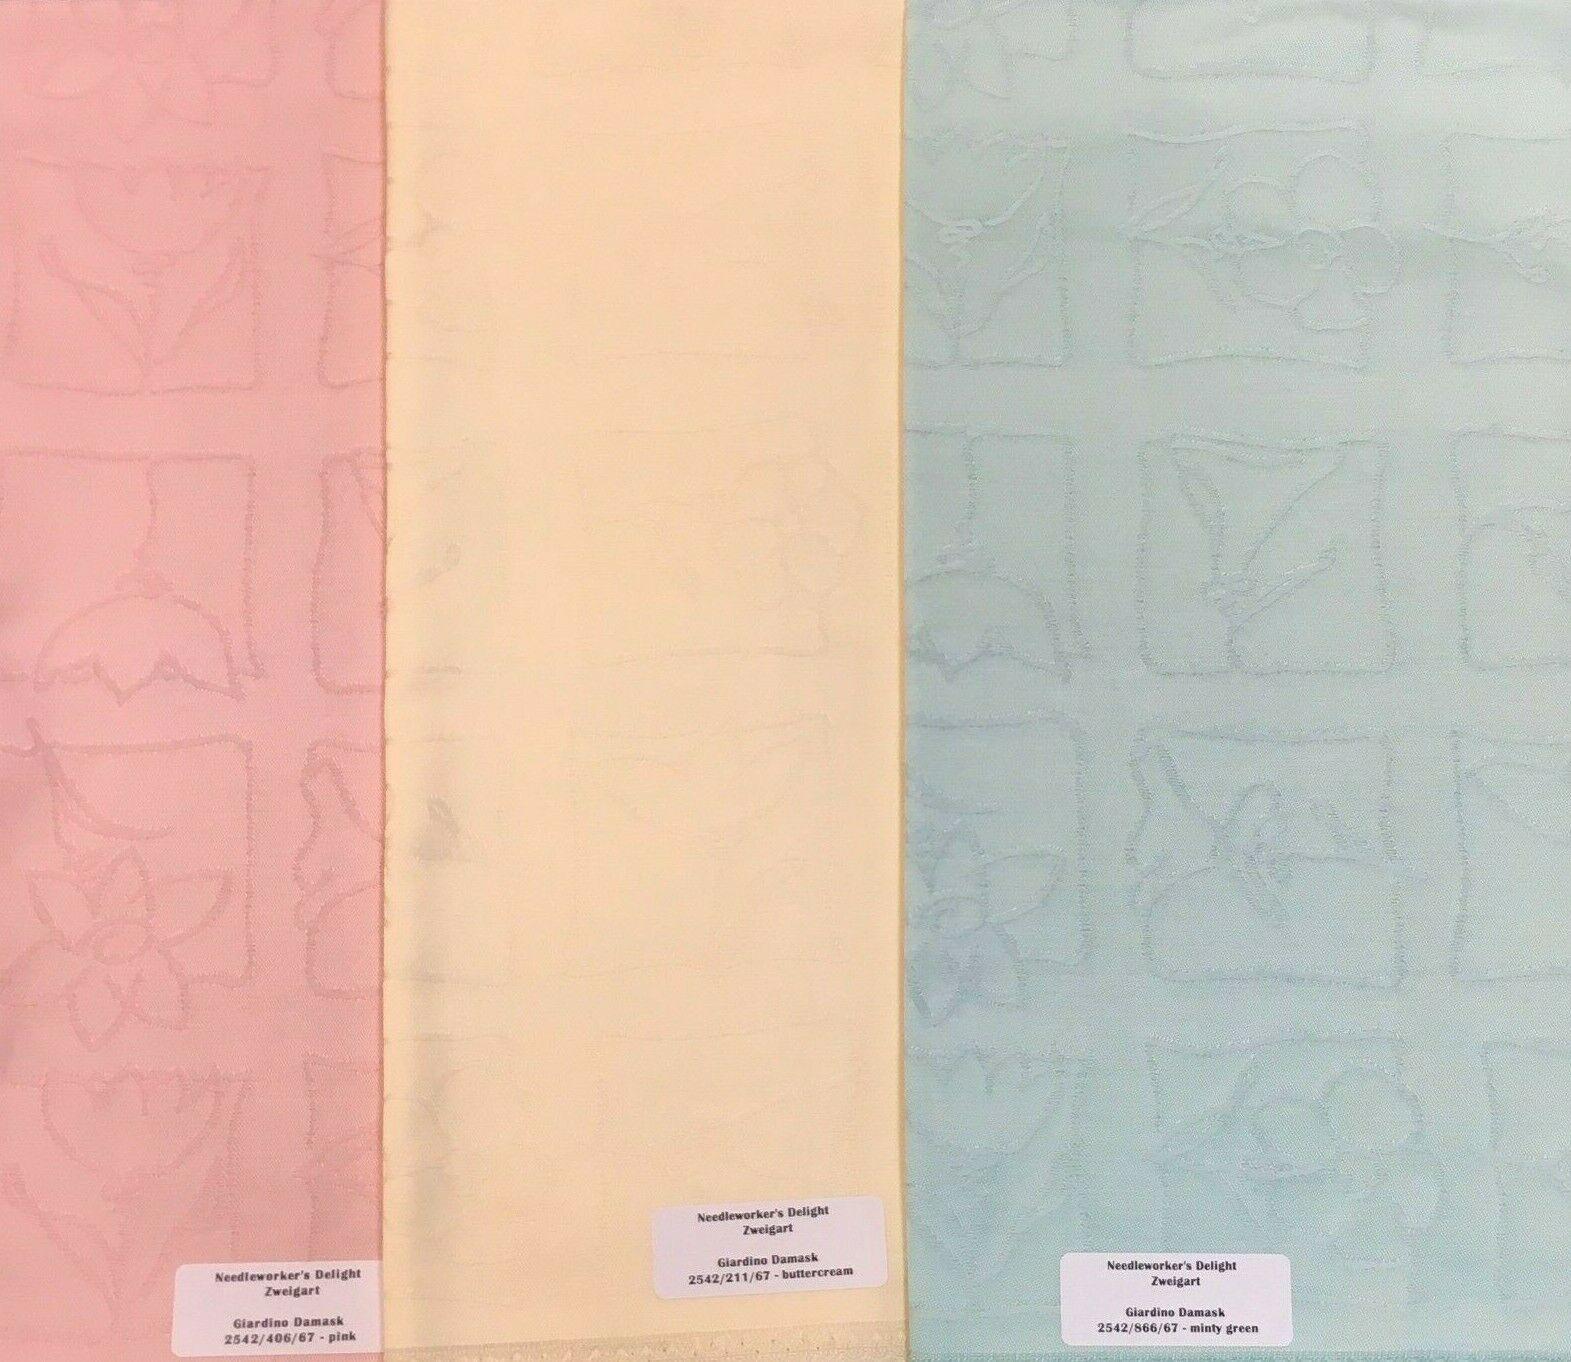 Zweigart Giardino Damask Fabric Embroidery or Needlework Backing RARE 3 Colors - $16.95